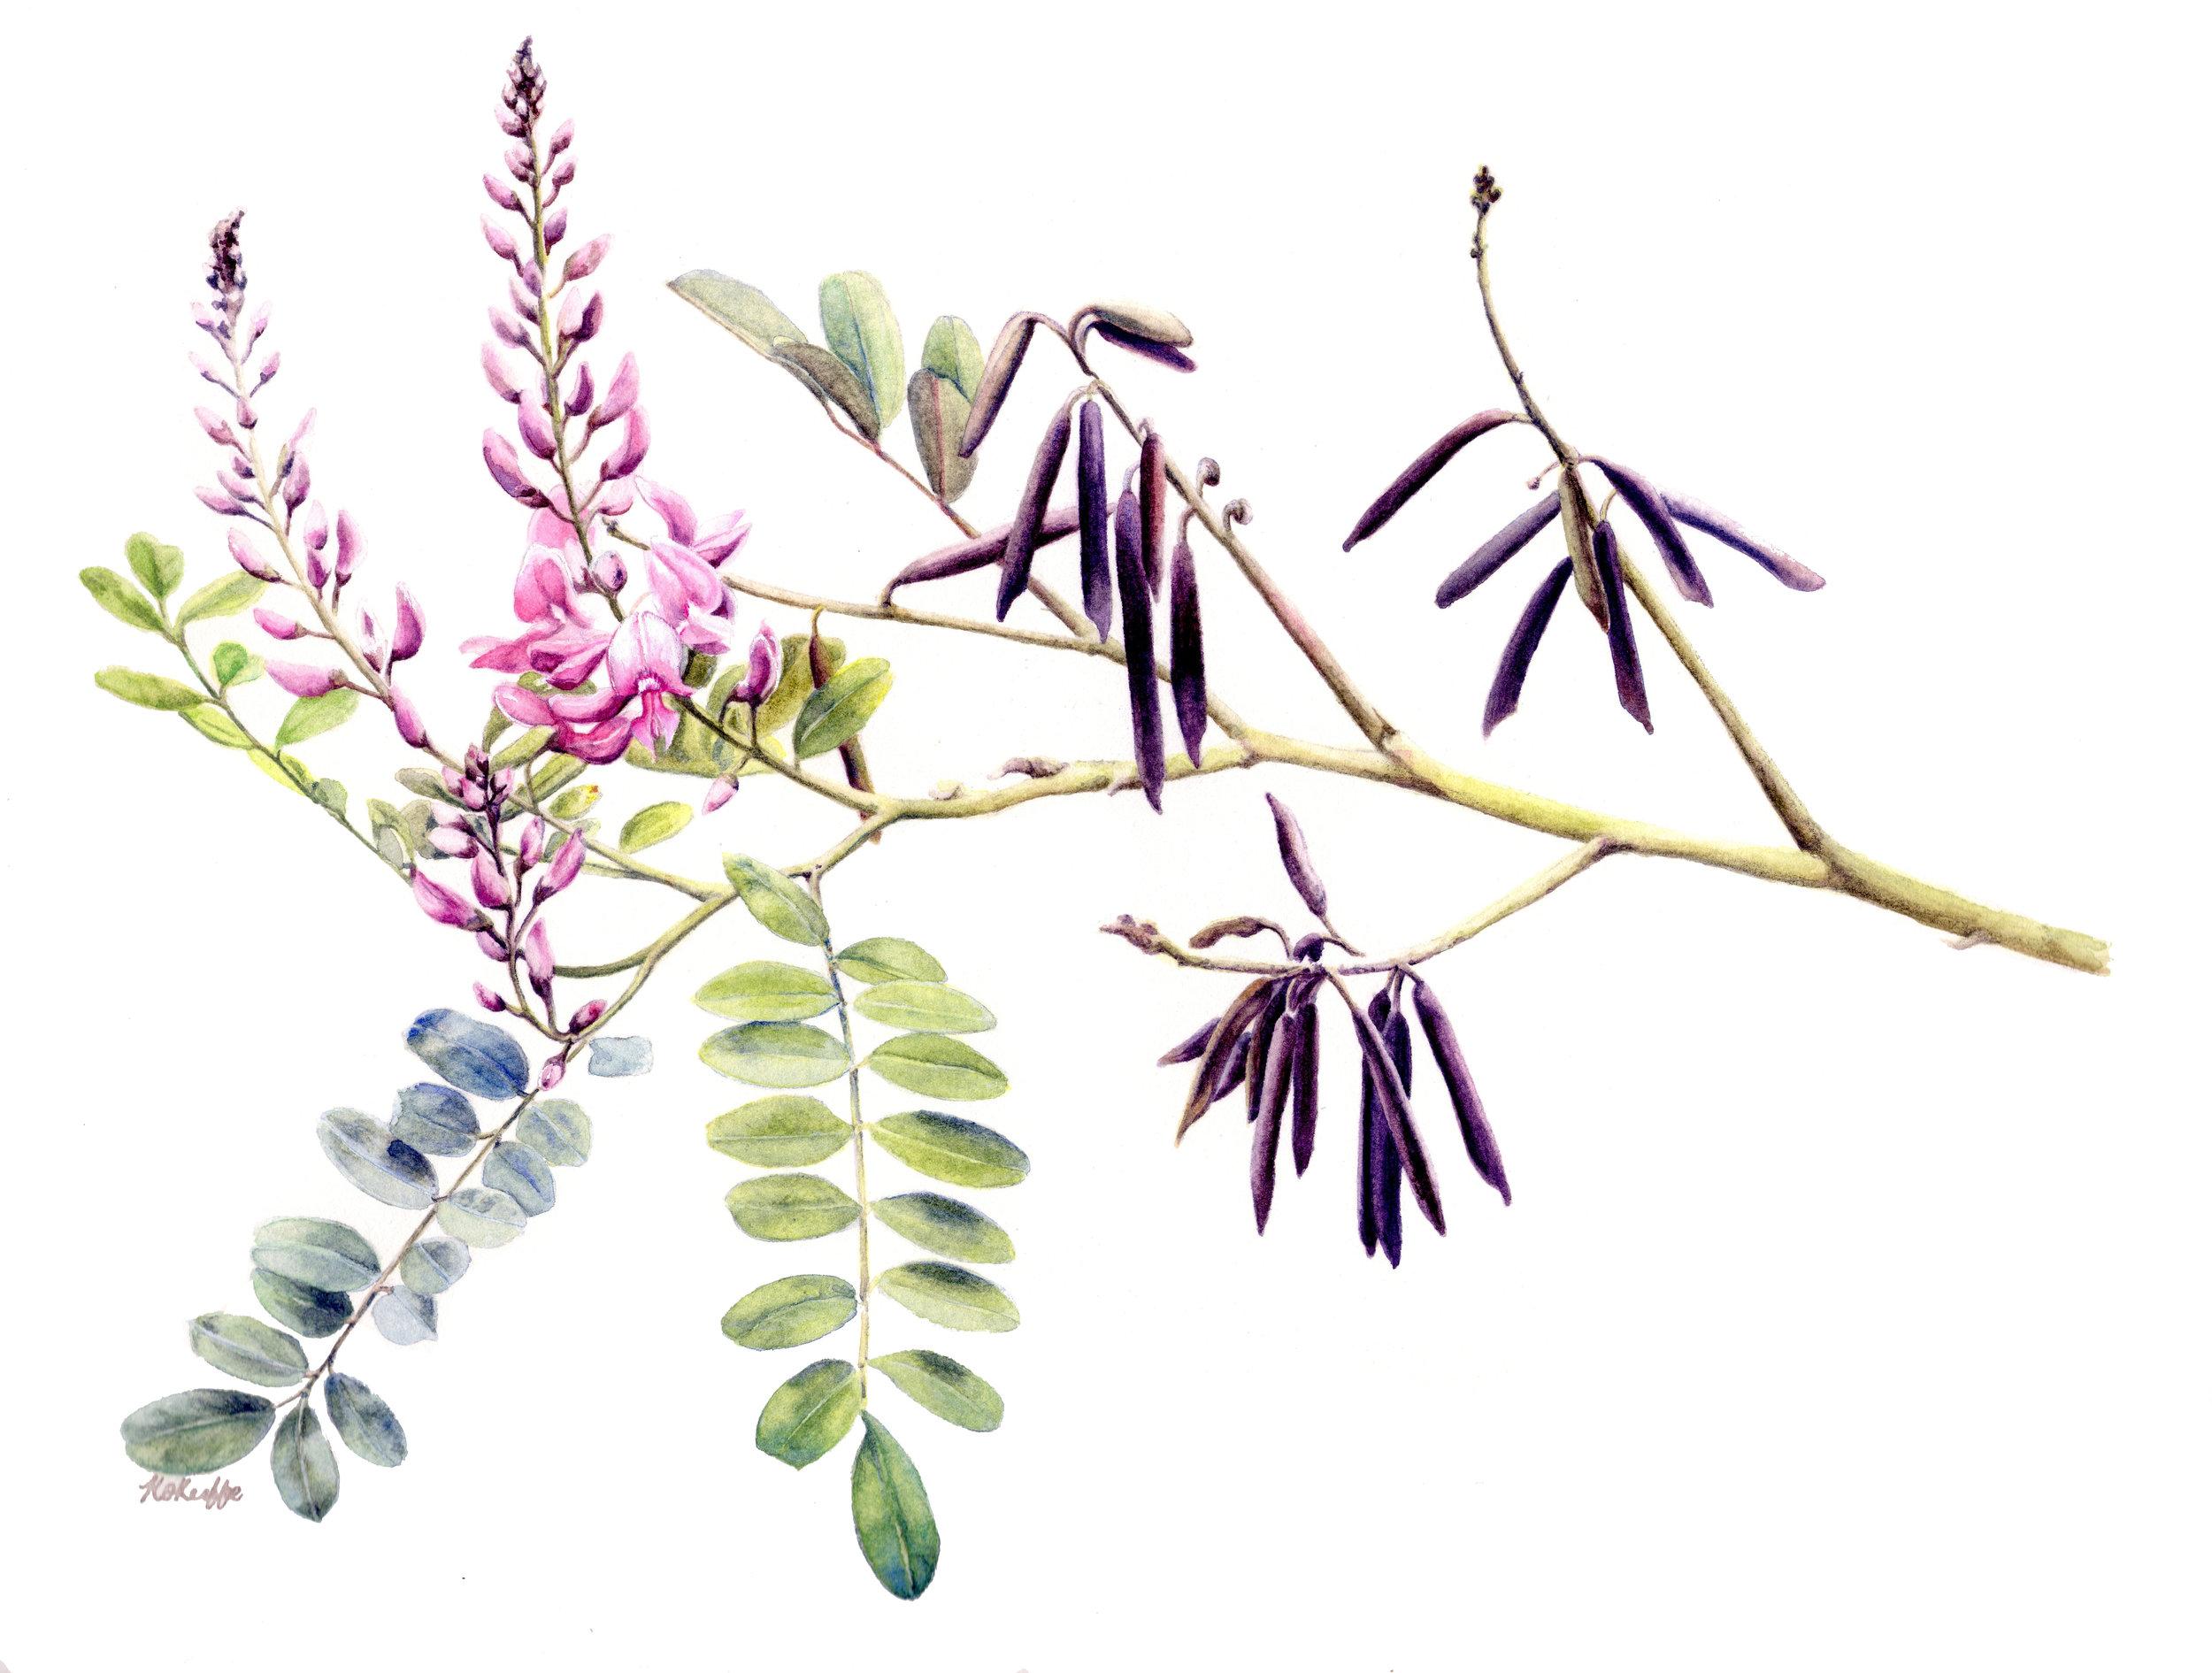 Indigofera australis